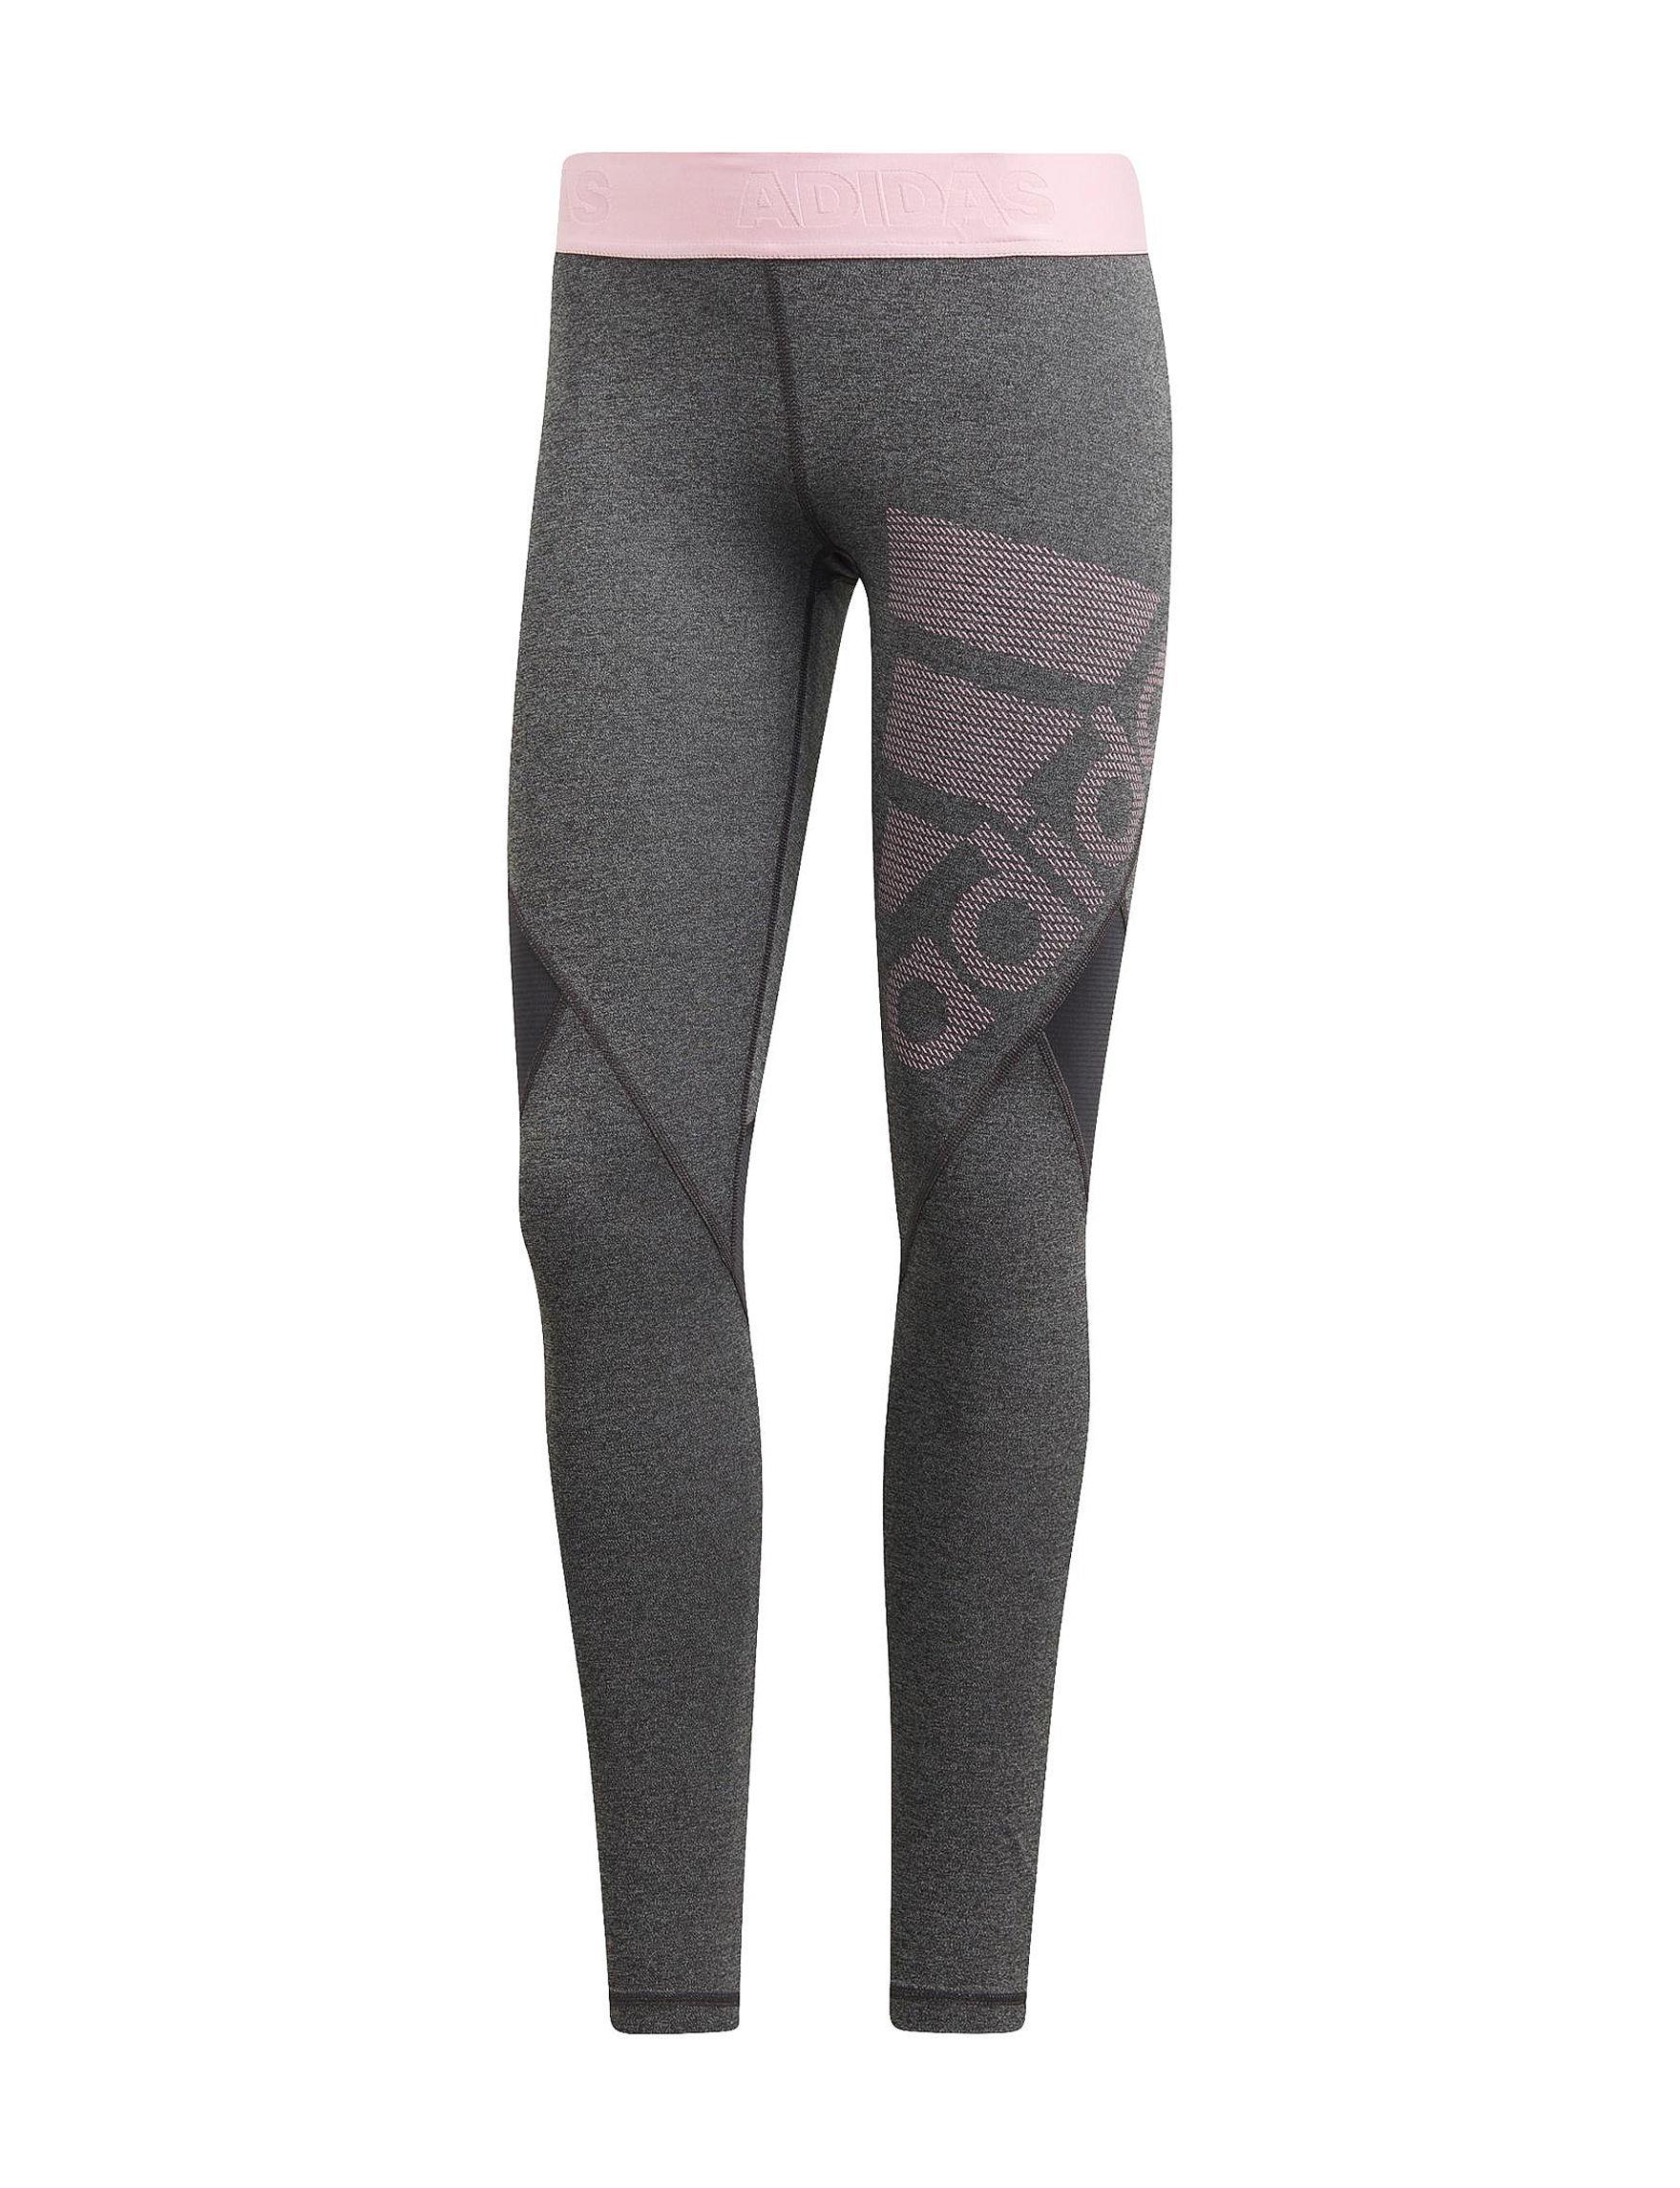 Adidas Grey / Pink Leggings